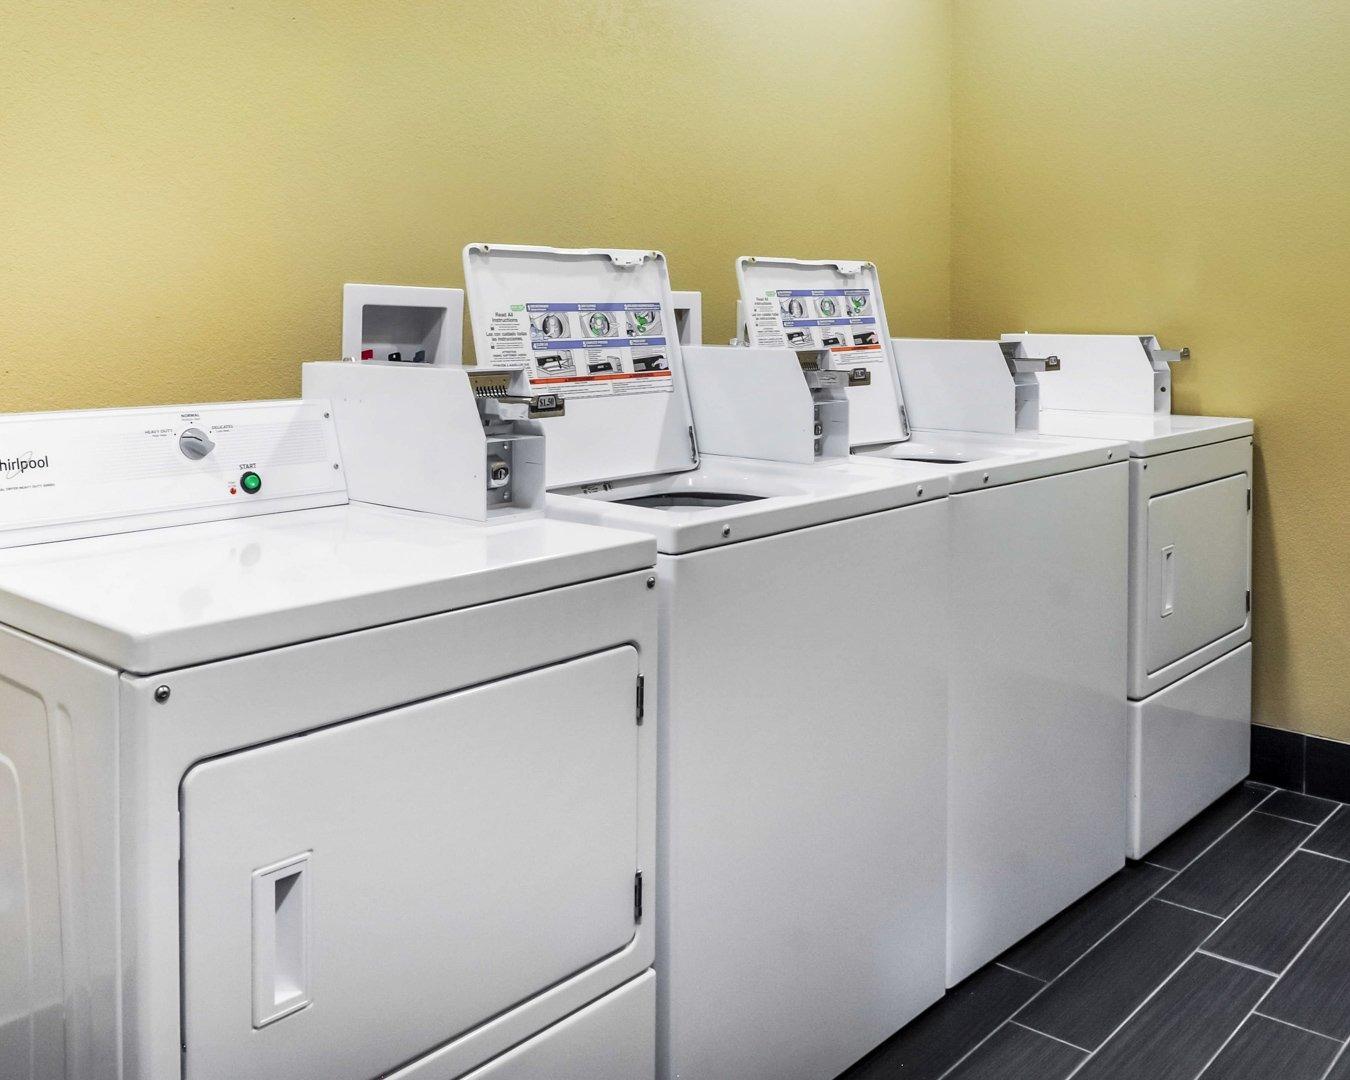 Comfort Inn and Suites - Artesia, Artesia NM